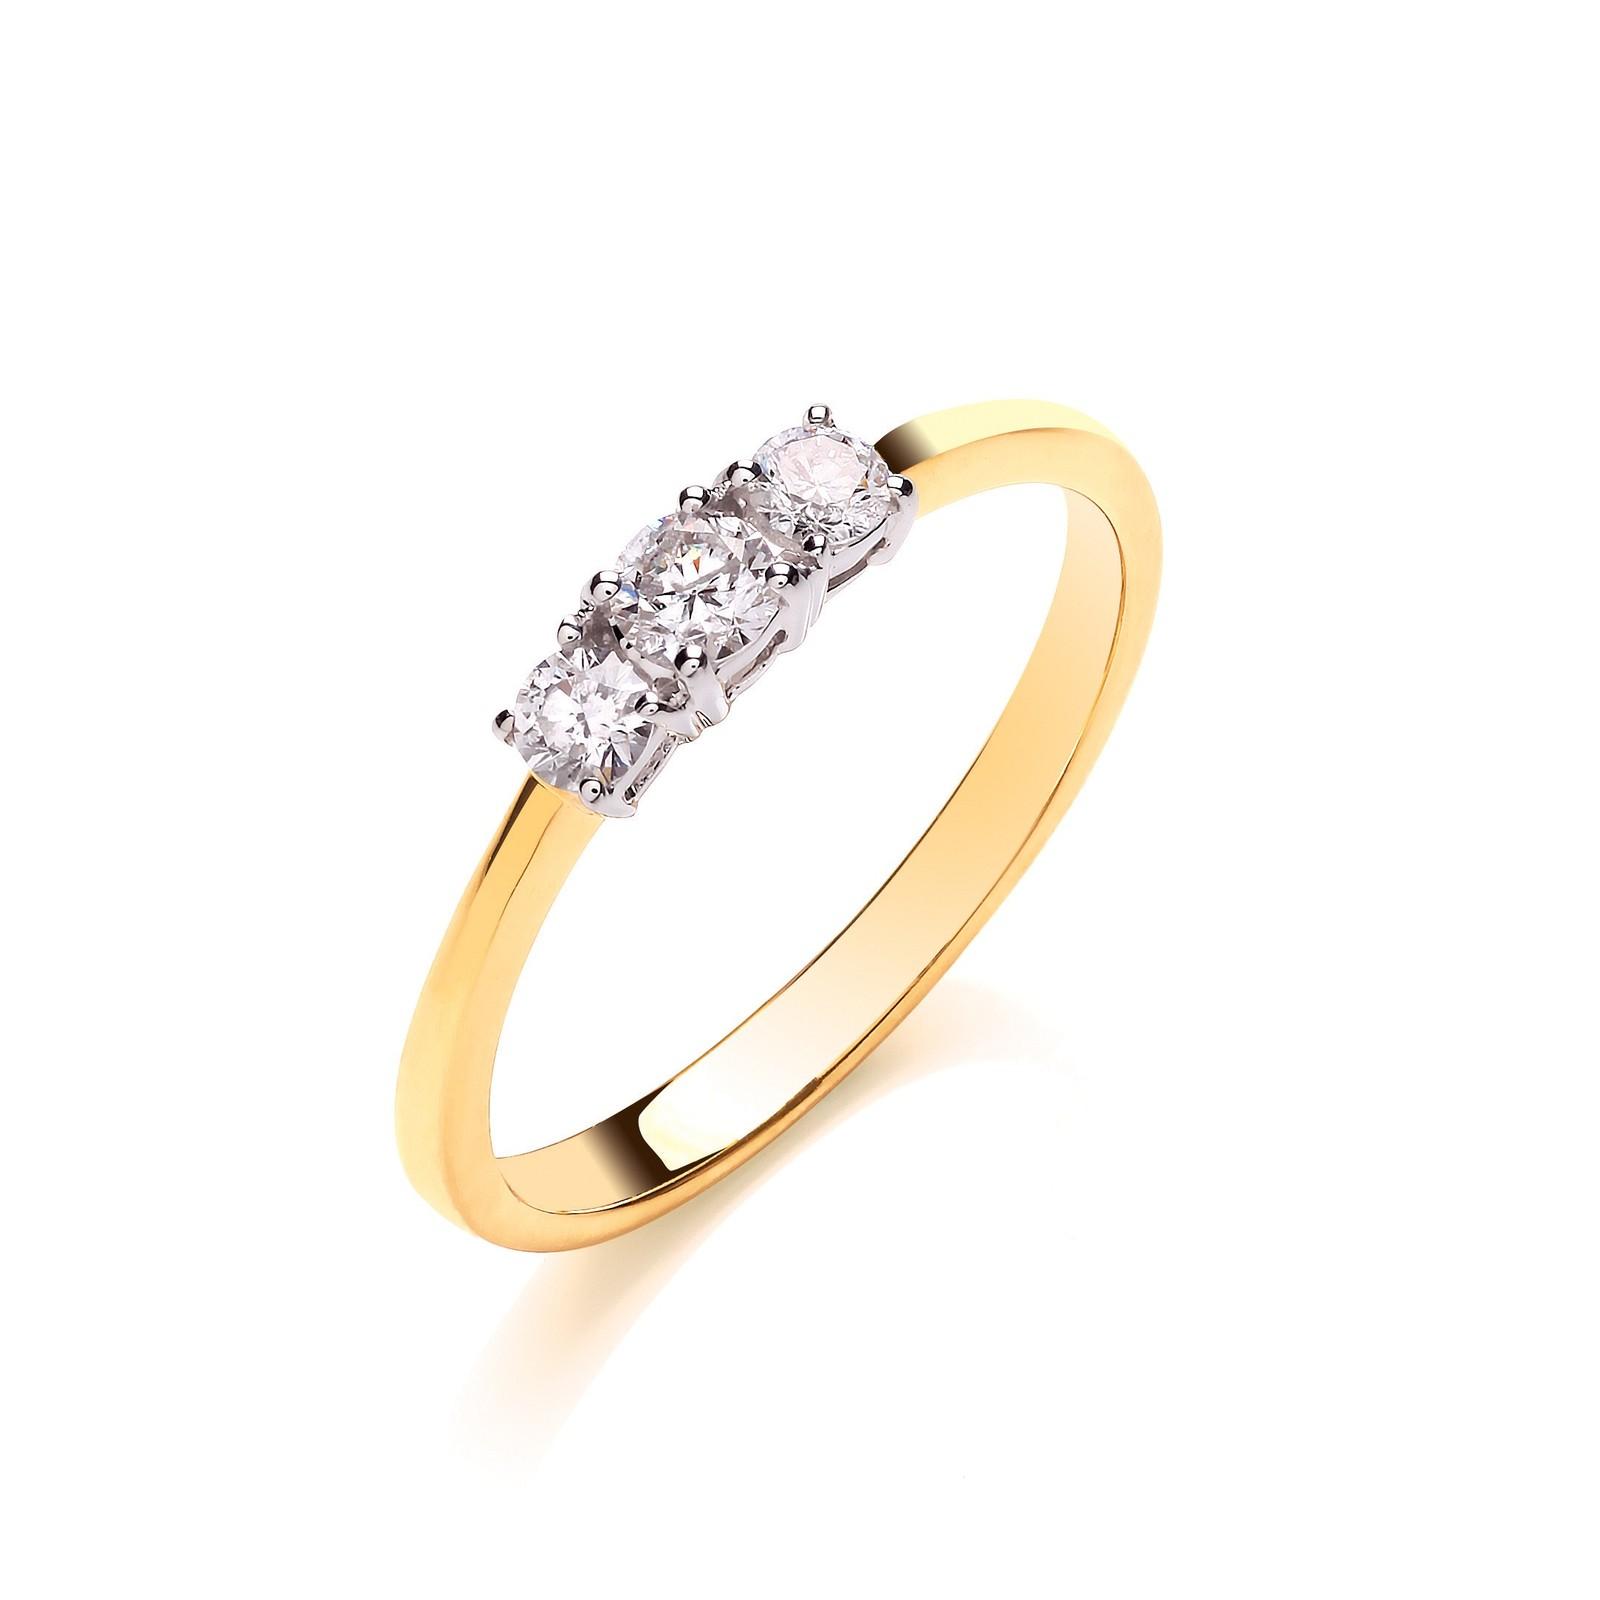 18ct Yellow Gold 0.33ctw Diamond Trilogy Ring